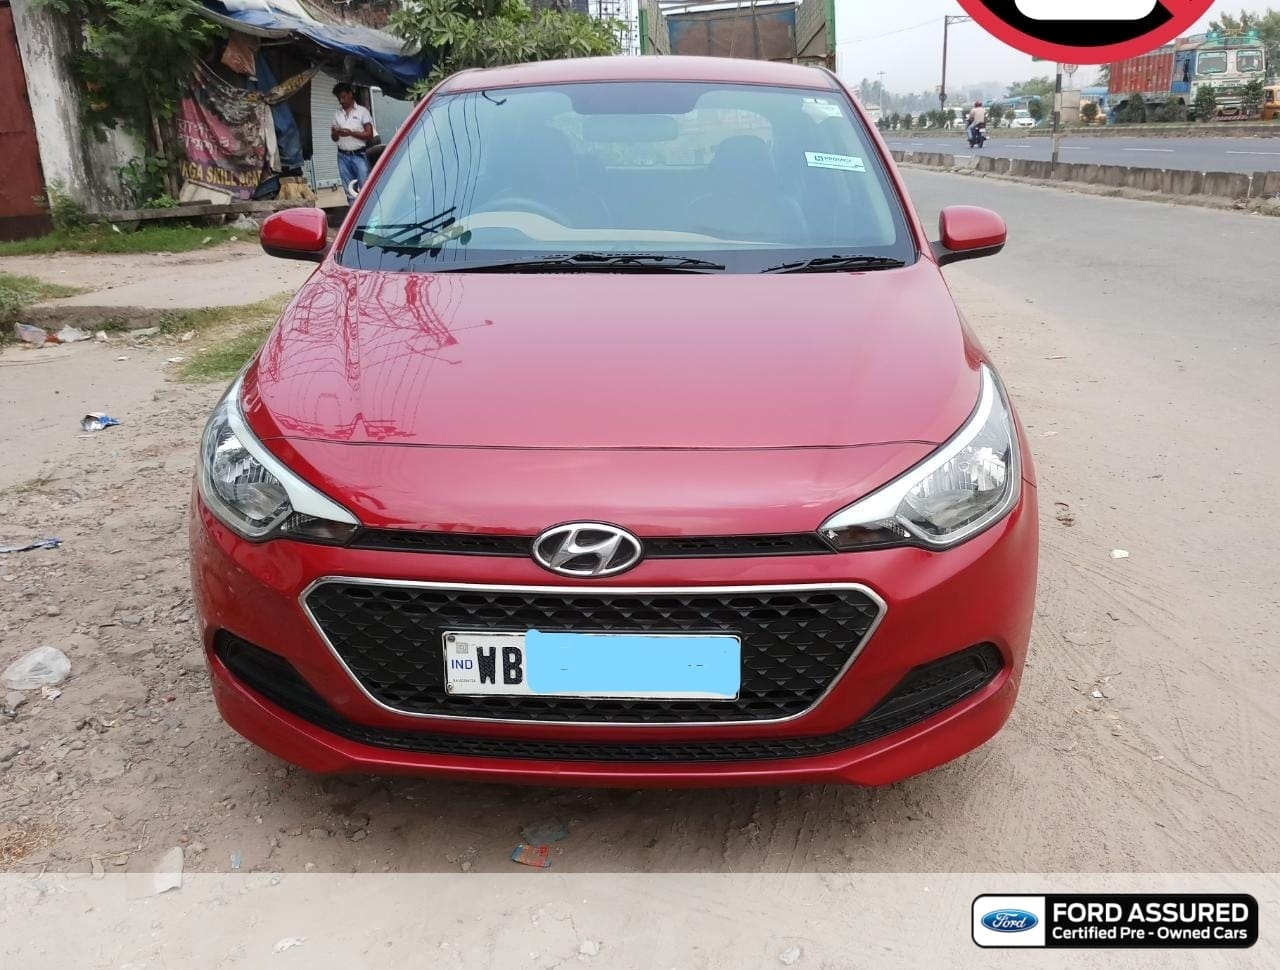 Hyundai Elite i20 2014-2015 Magna 1.2